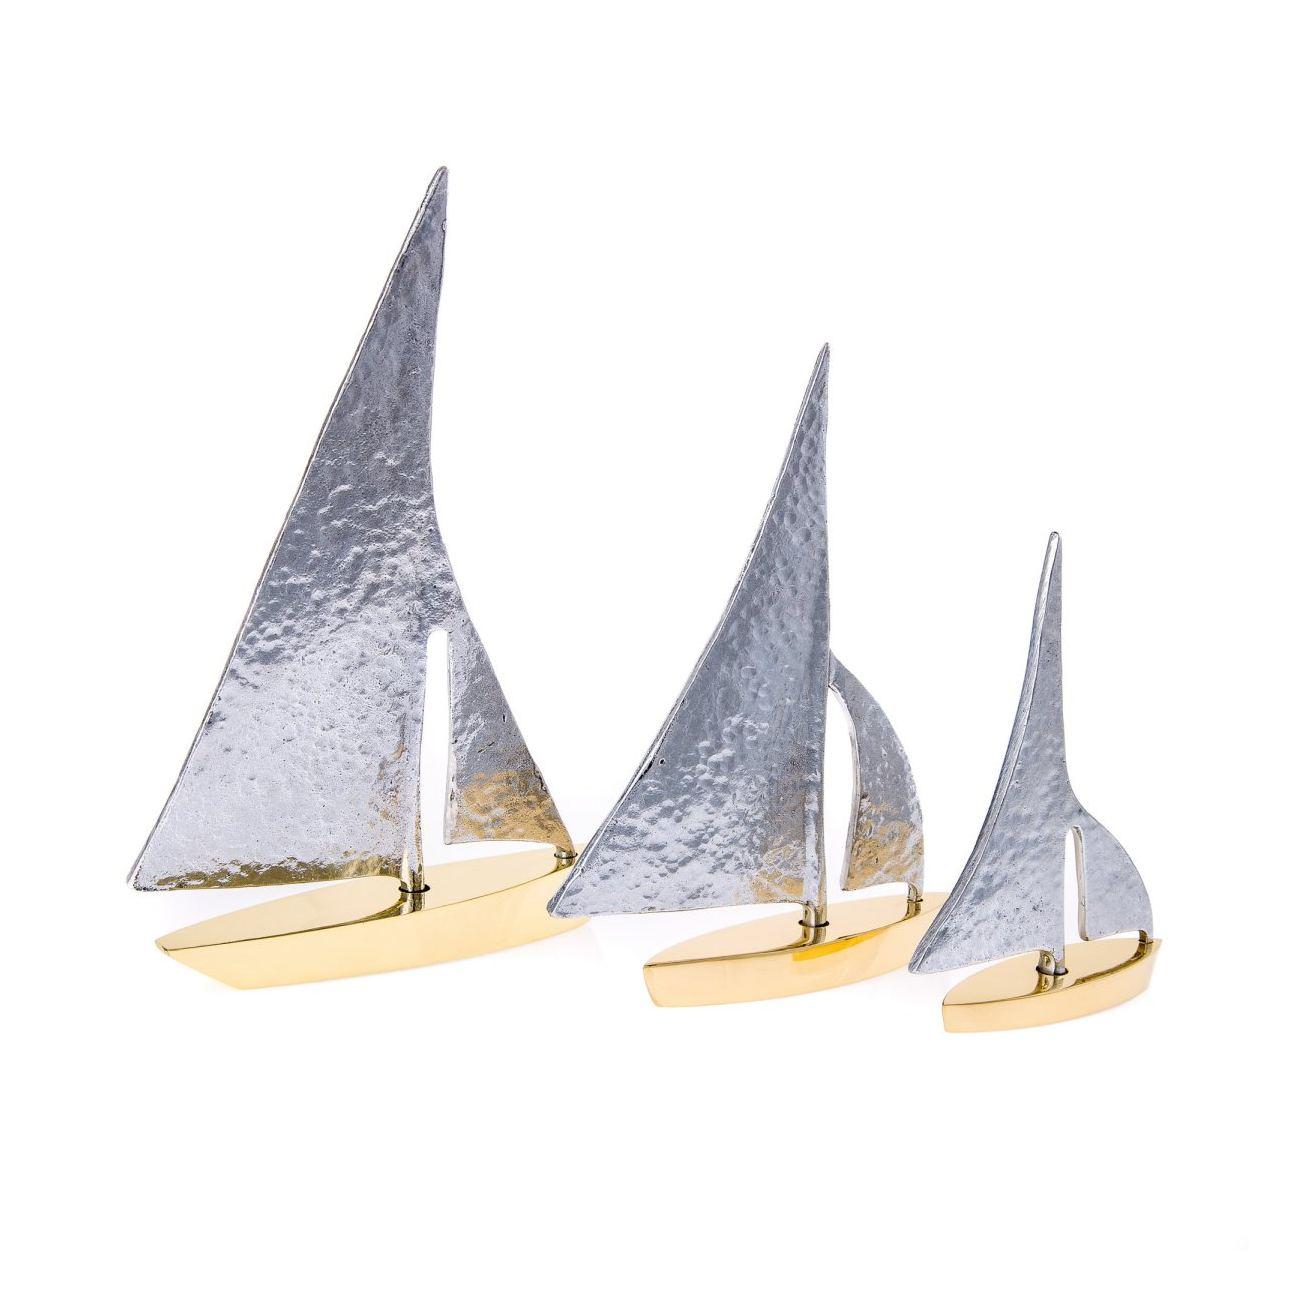 Sailing boat set of handmade metal decorative